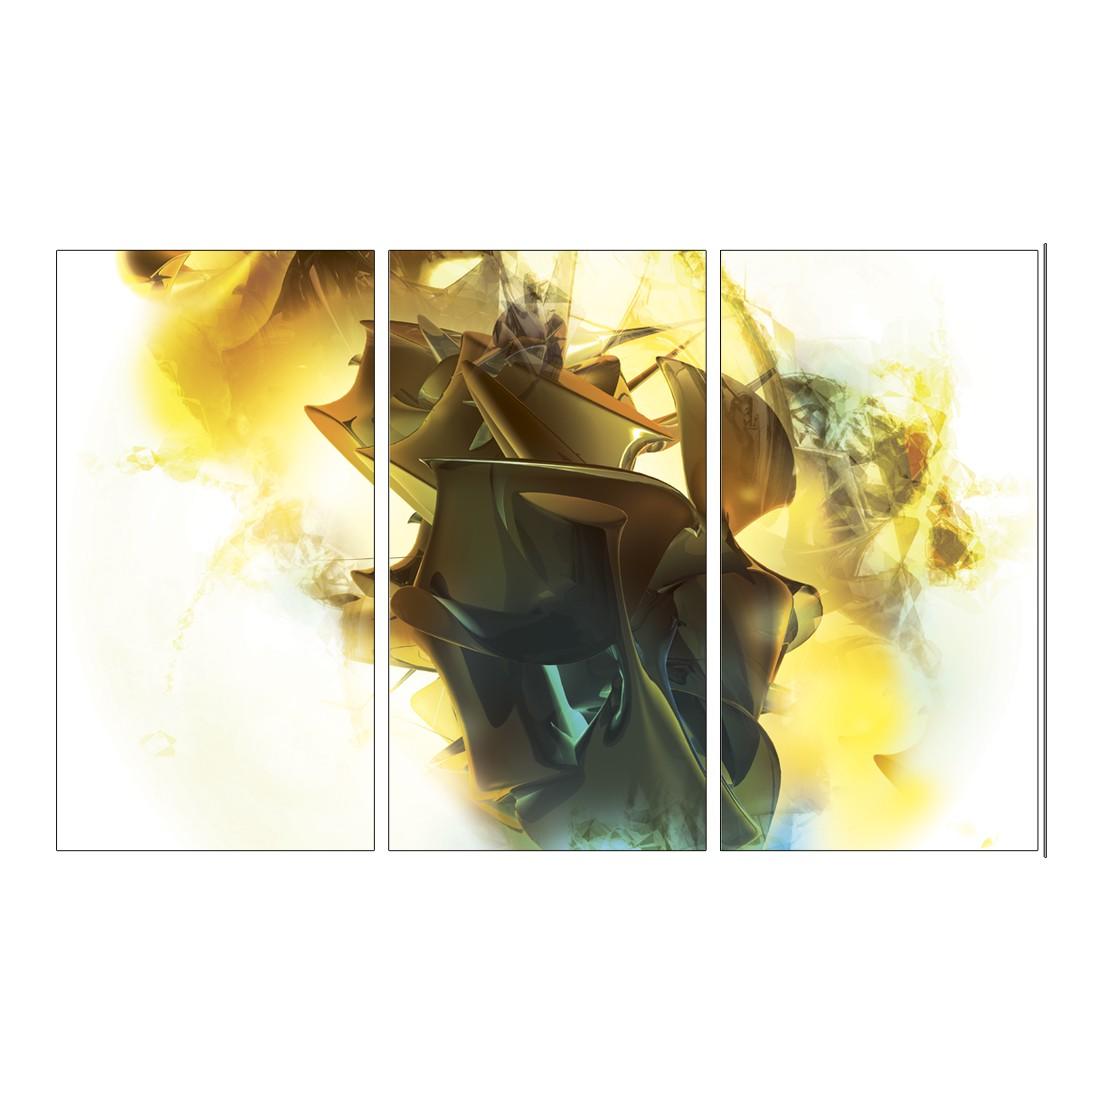 Leinwandbild Abstrakt Gelb – 120 x 80cm, Gallery of Innovative Art günstig kaufen